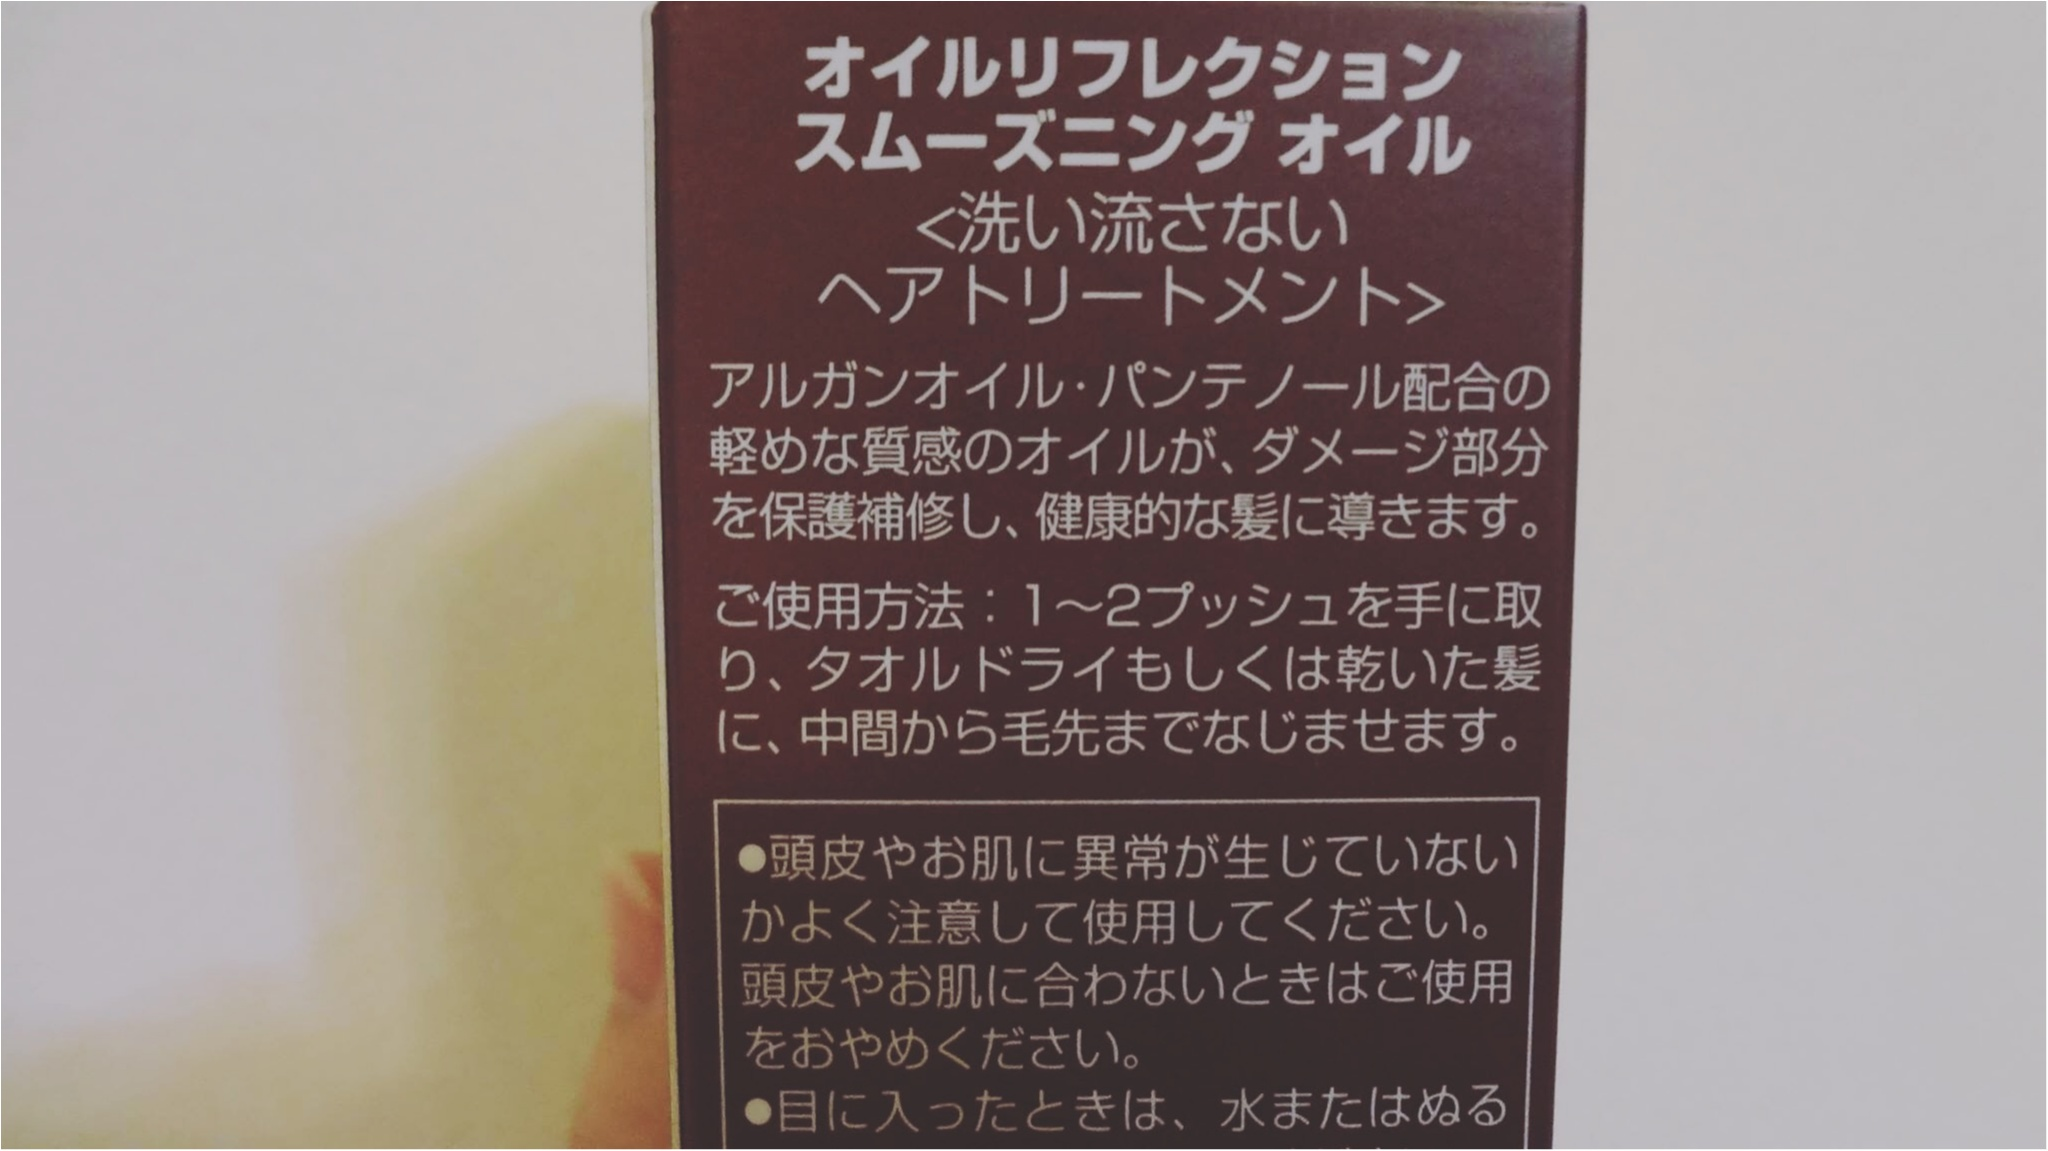 【WELLA】アルガンオイル配合のトリートメントオイル✨ツヤ出し・ダメージ防止・乾燥ケアしちゃお♡ココナッツの香りにも癒されて♩≪samenyan≫_2